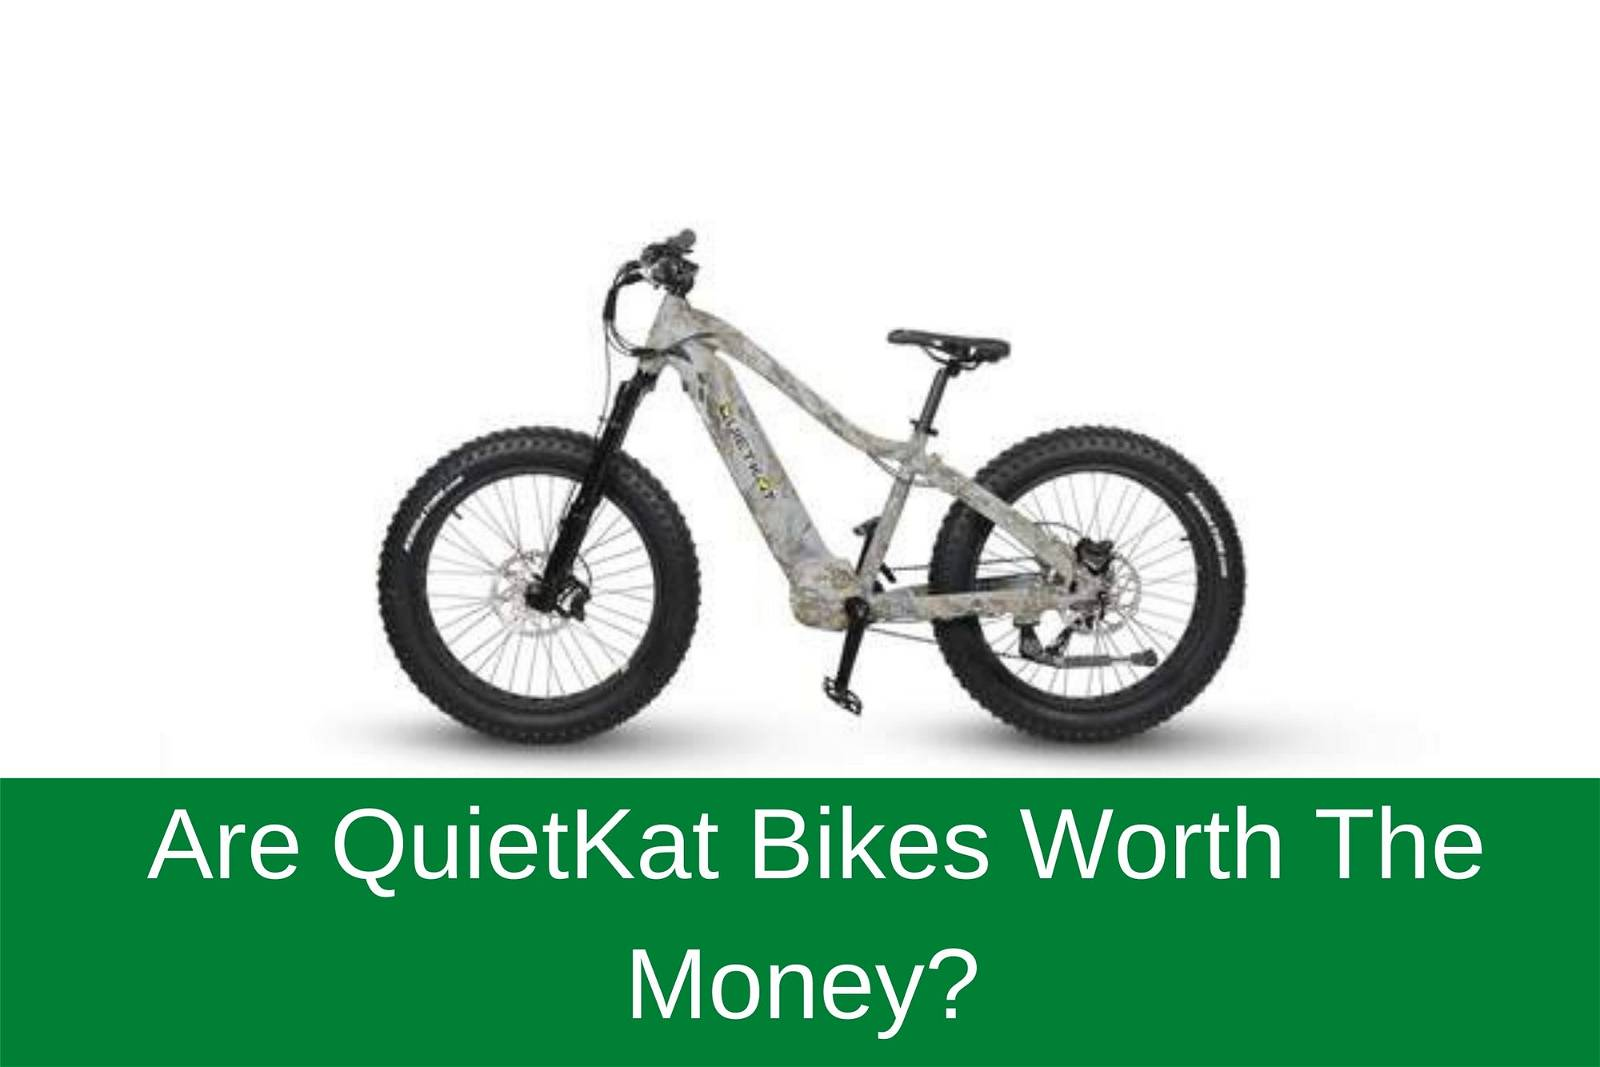 Are QuietKat Bikes Worth the Money?